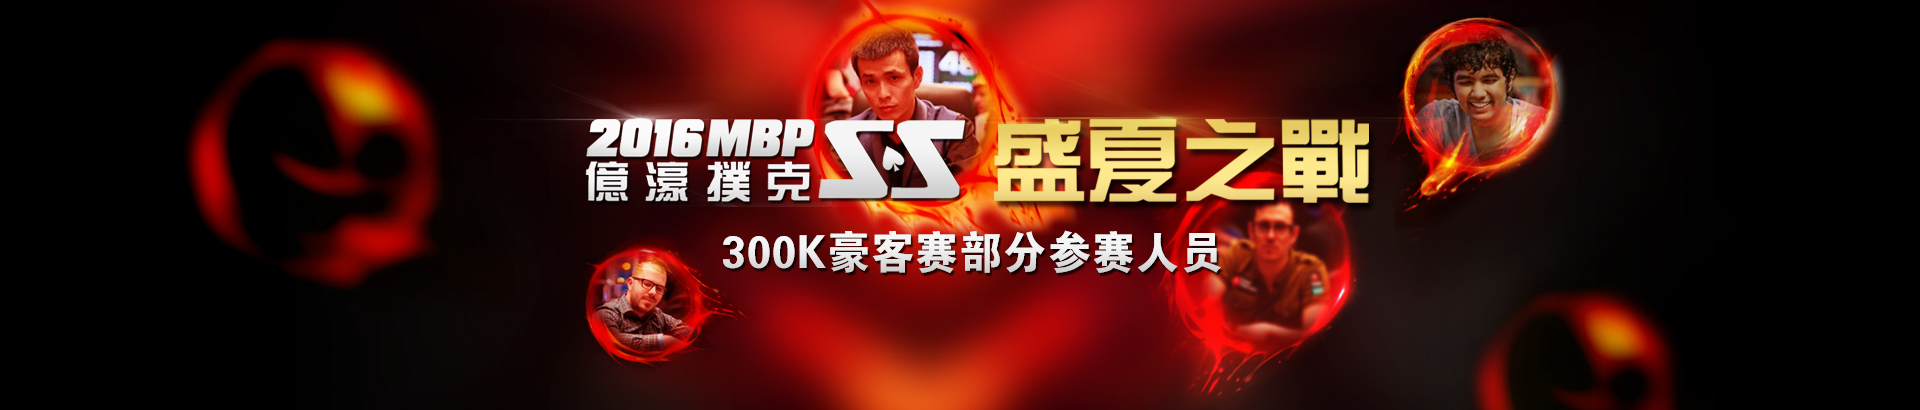 2016MBP盛夏之战300K港元豪客赛参赛名单